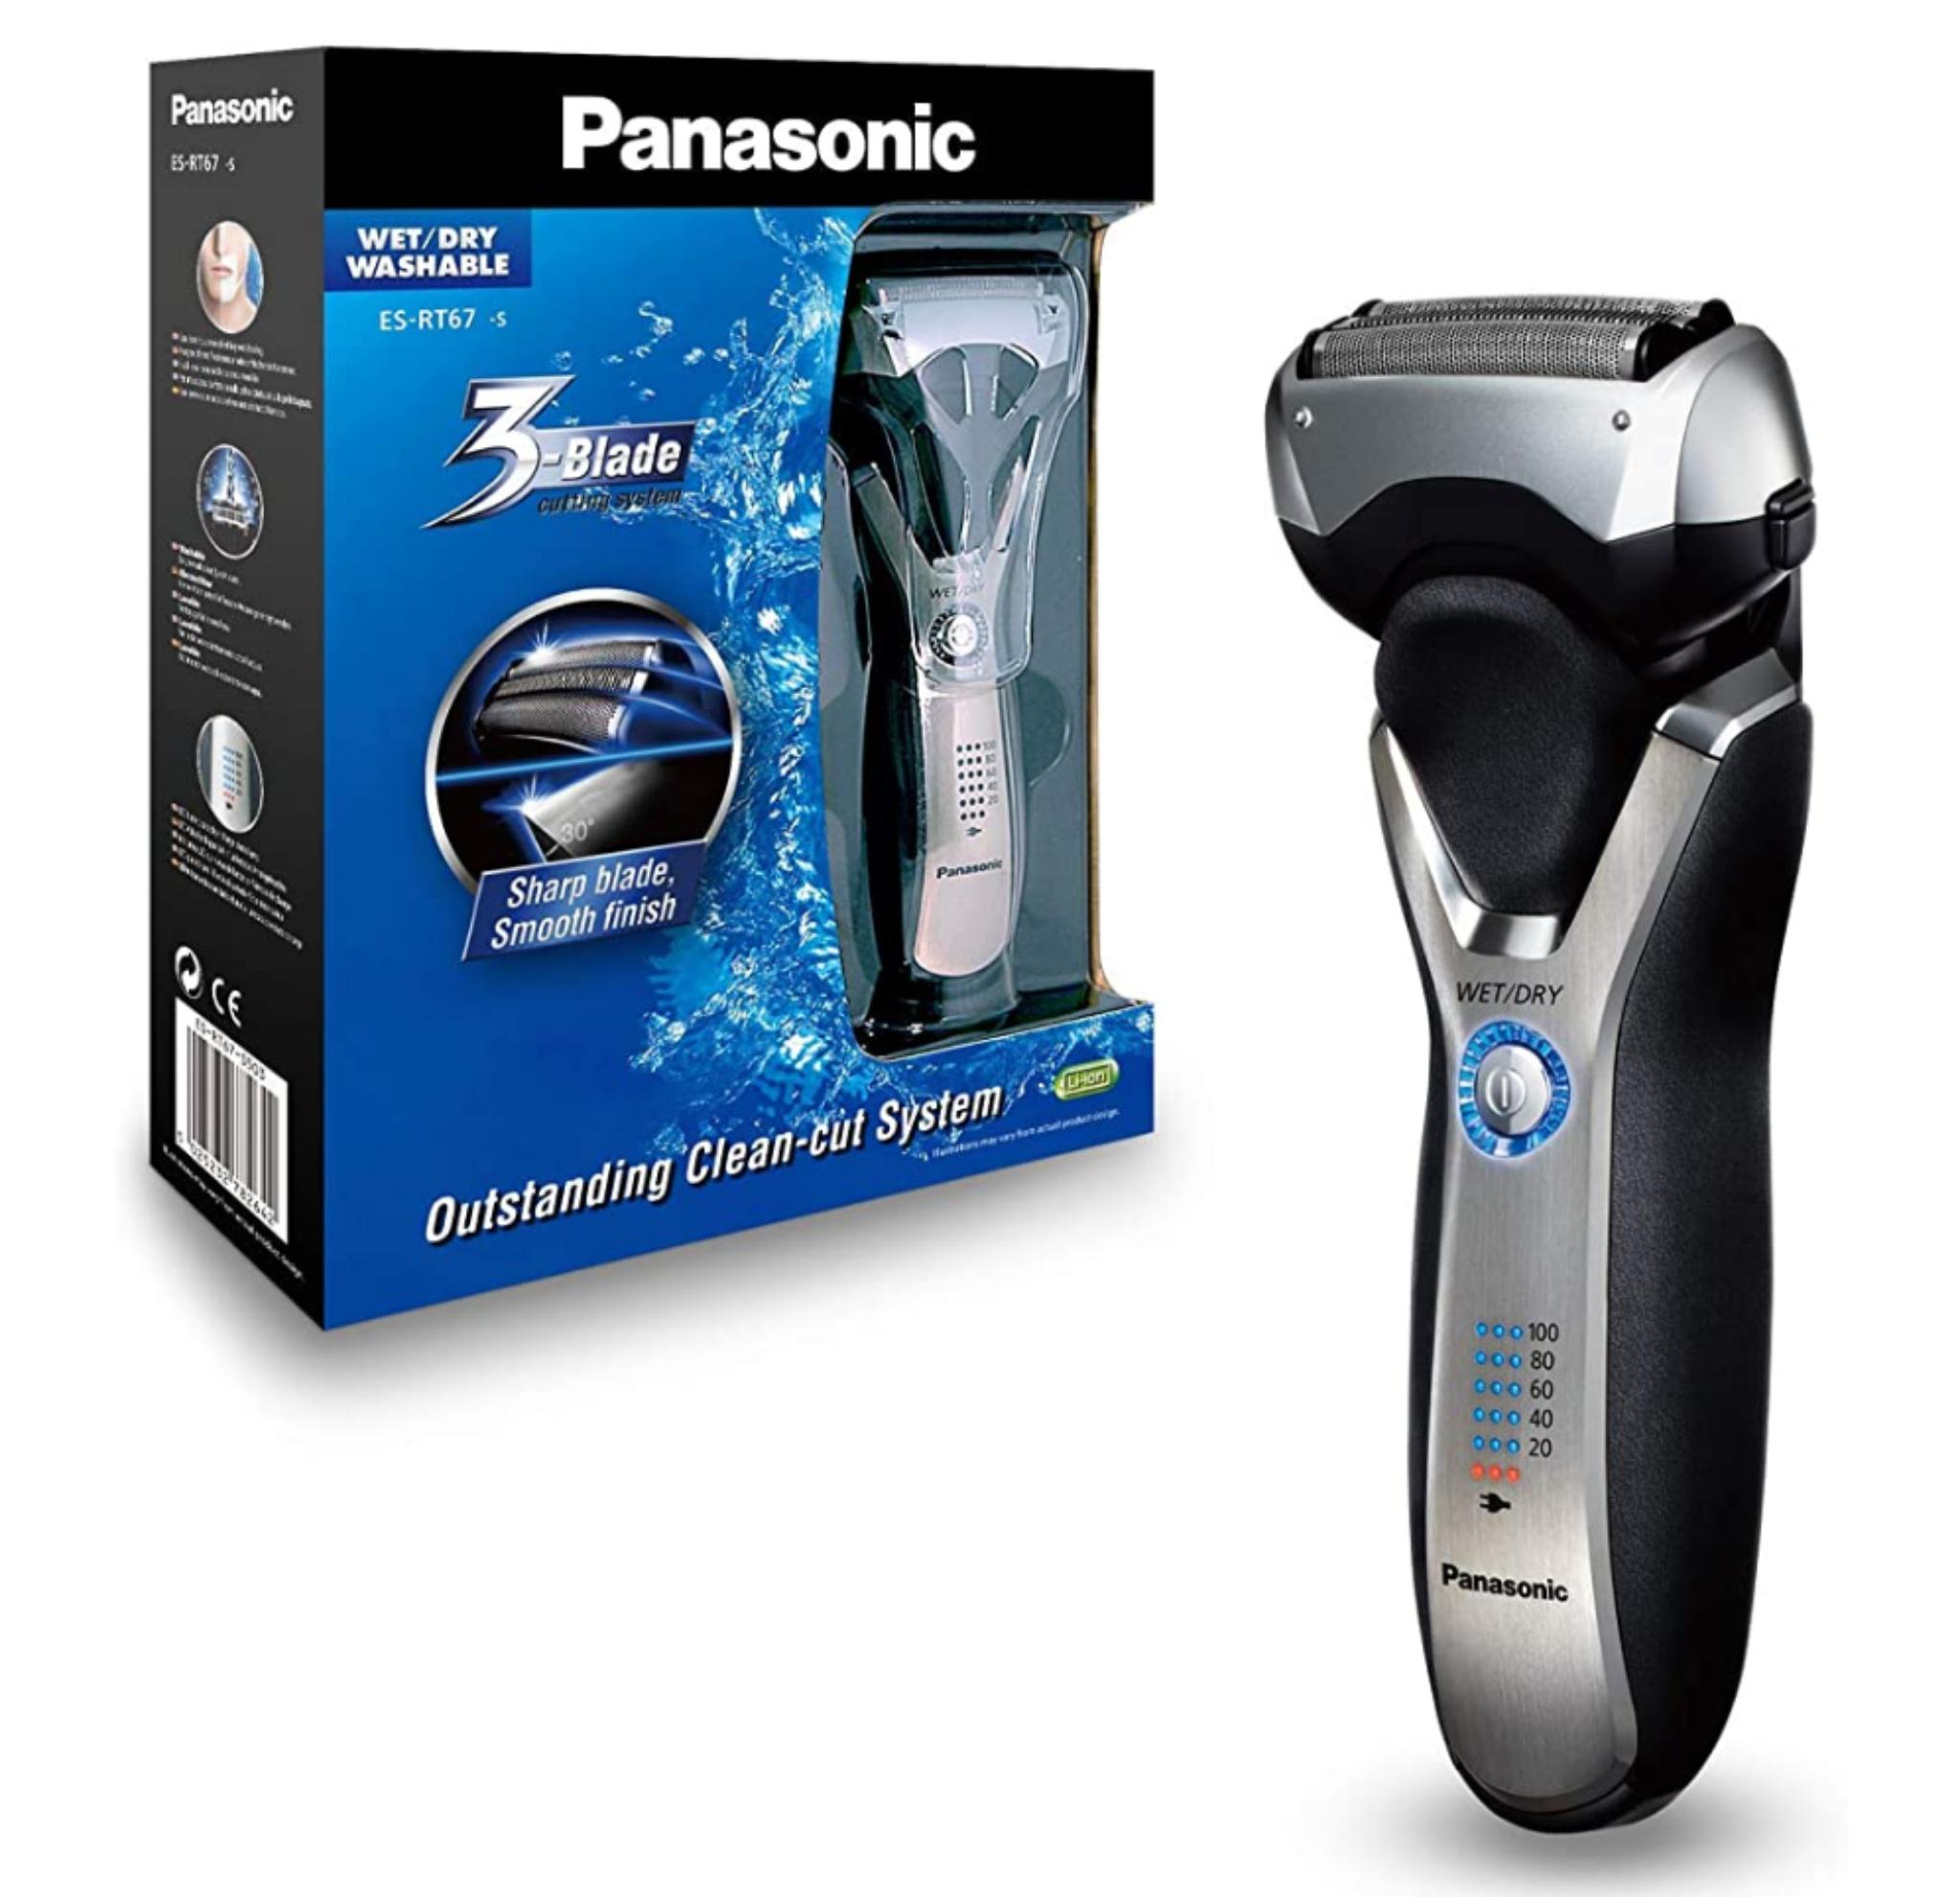 Panasonic Rasierer ES-RT67